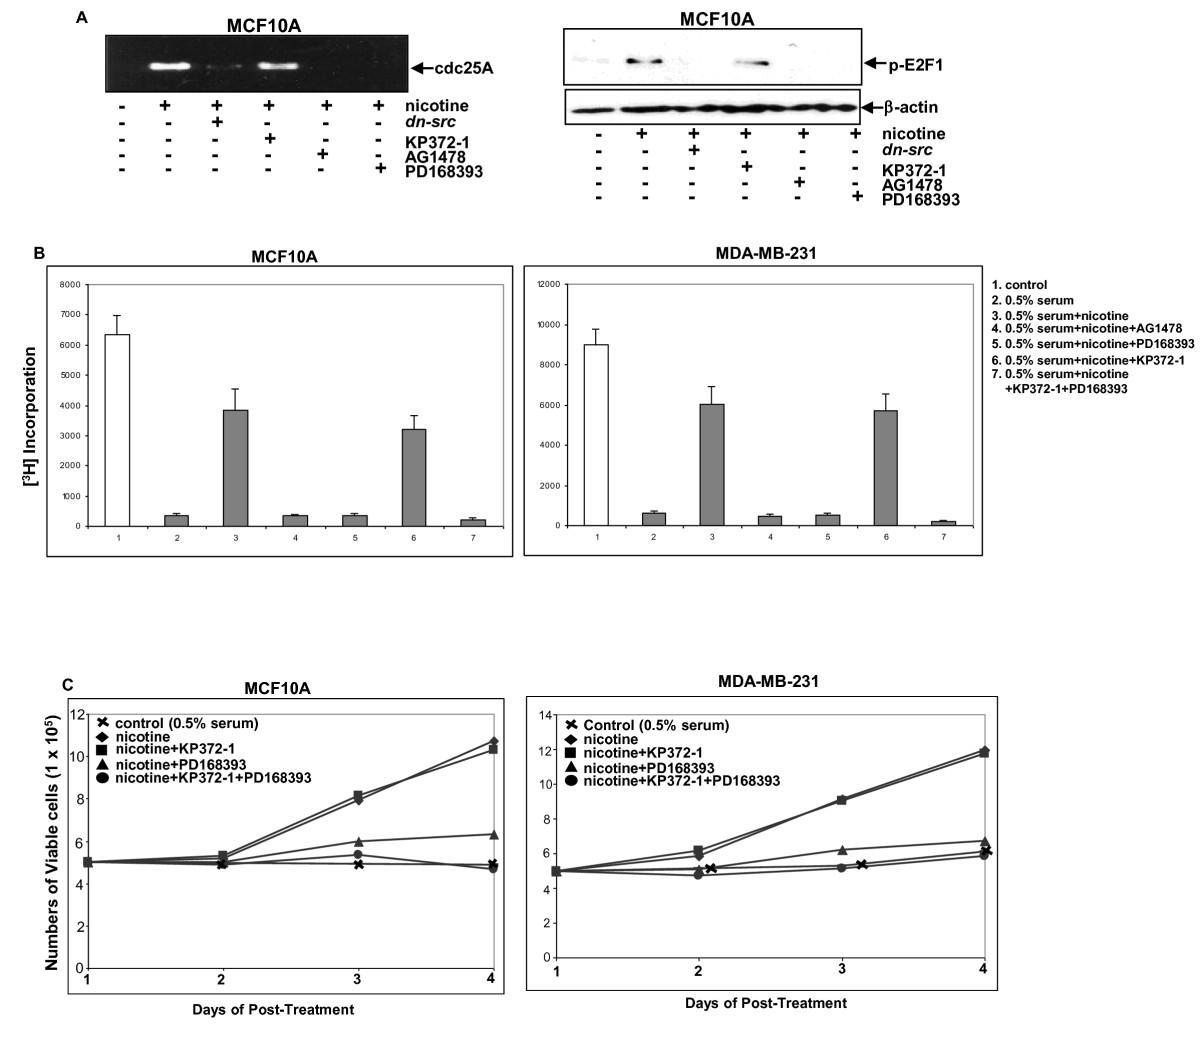 https://static-content.springer.com/image/art%3A10.1186%2Fbcr3055/MediaObjects/13058_2011_Article_2856_Fig5_HTML.jpg